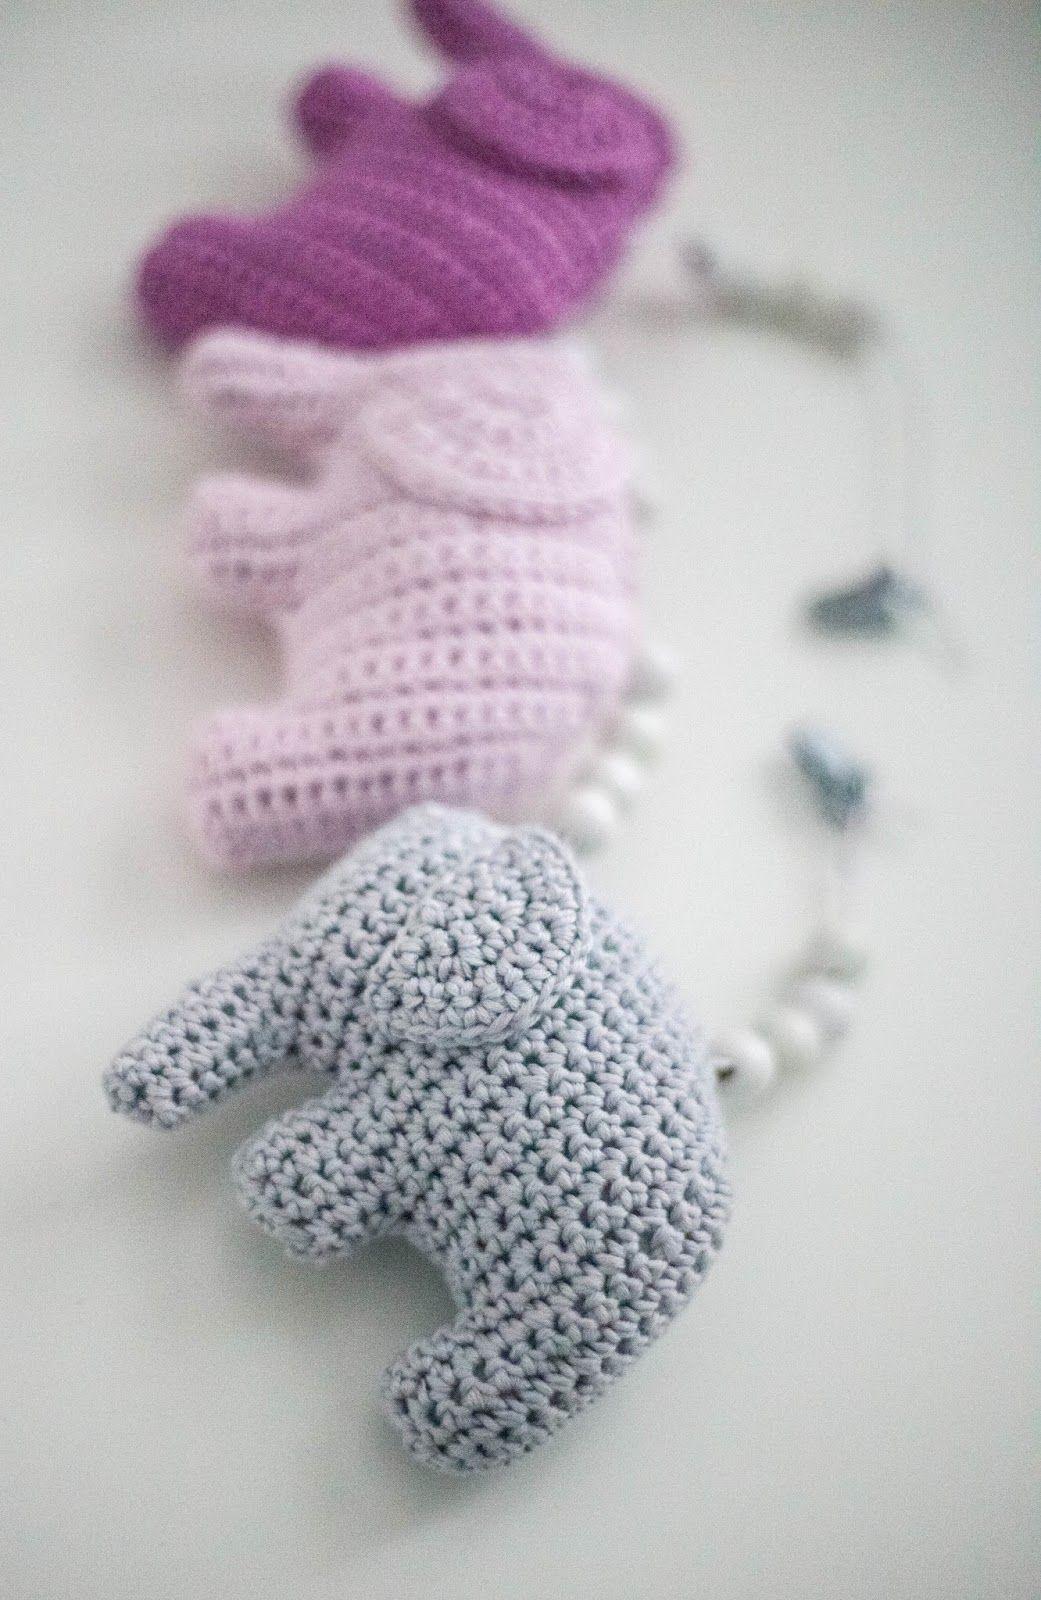 virkattu norsu   Knitting and crocheting for kids   Pinterest ...